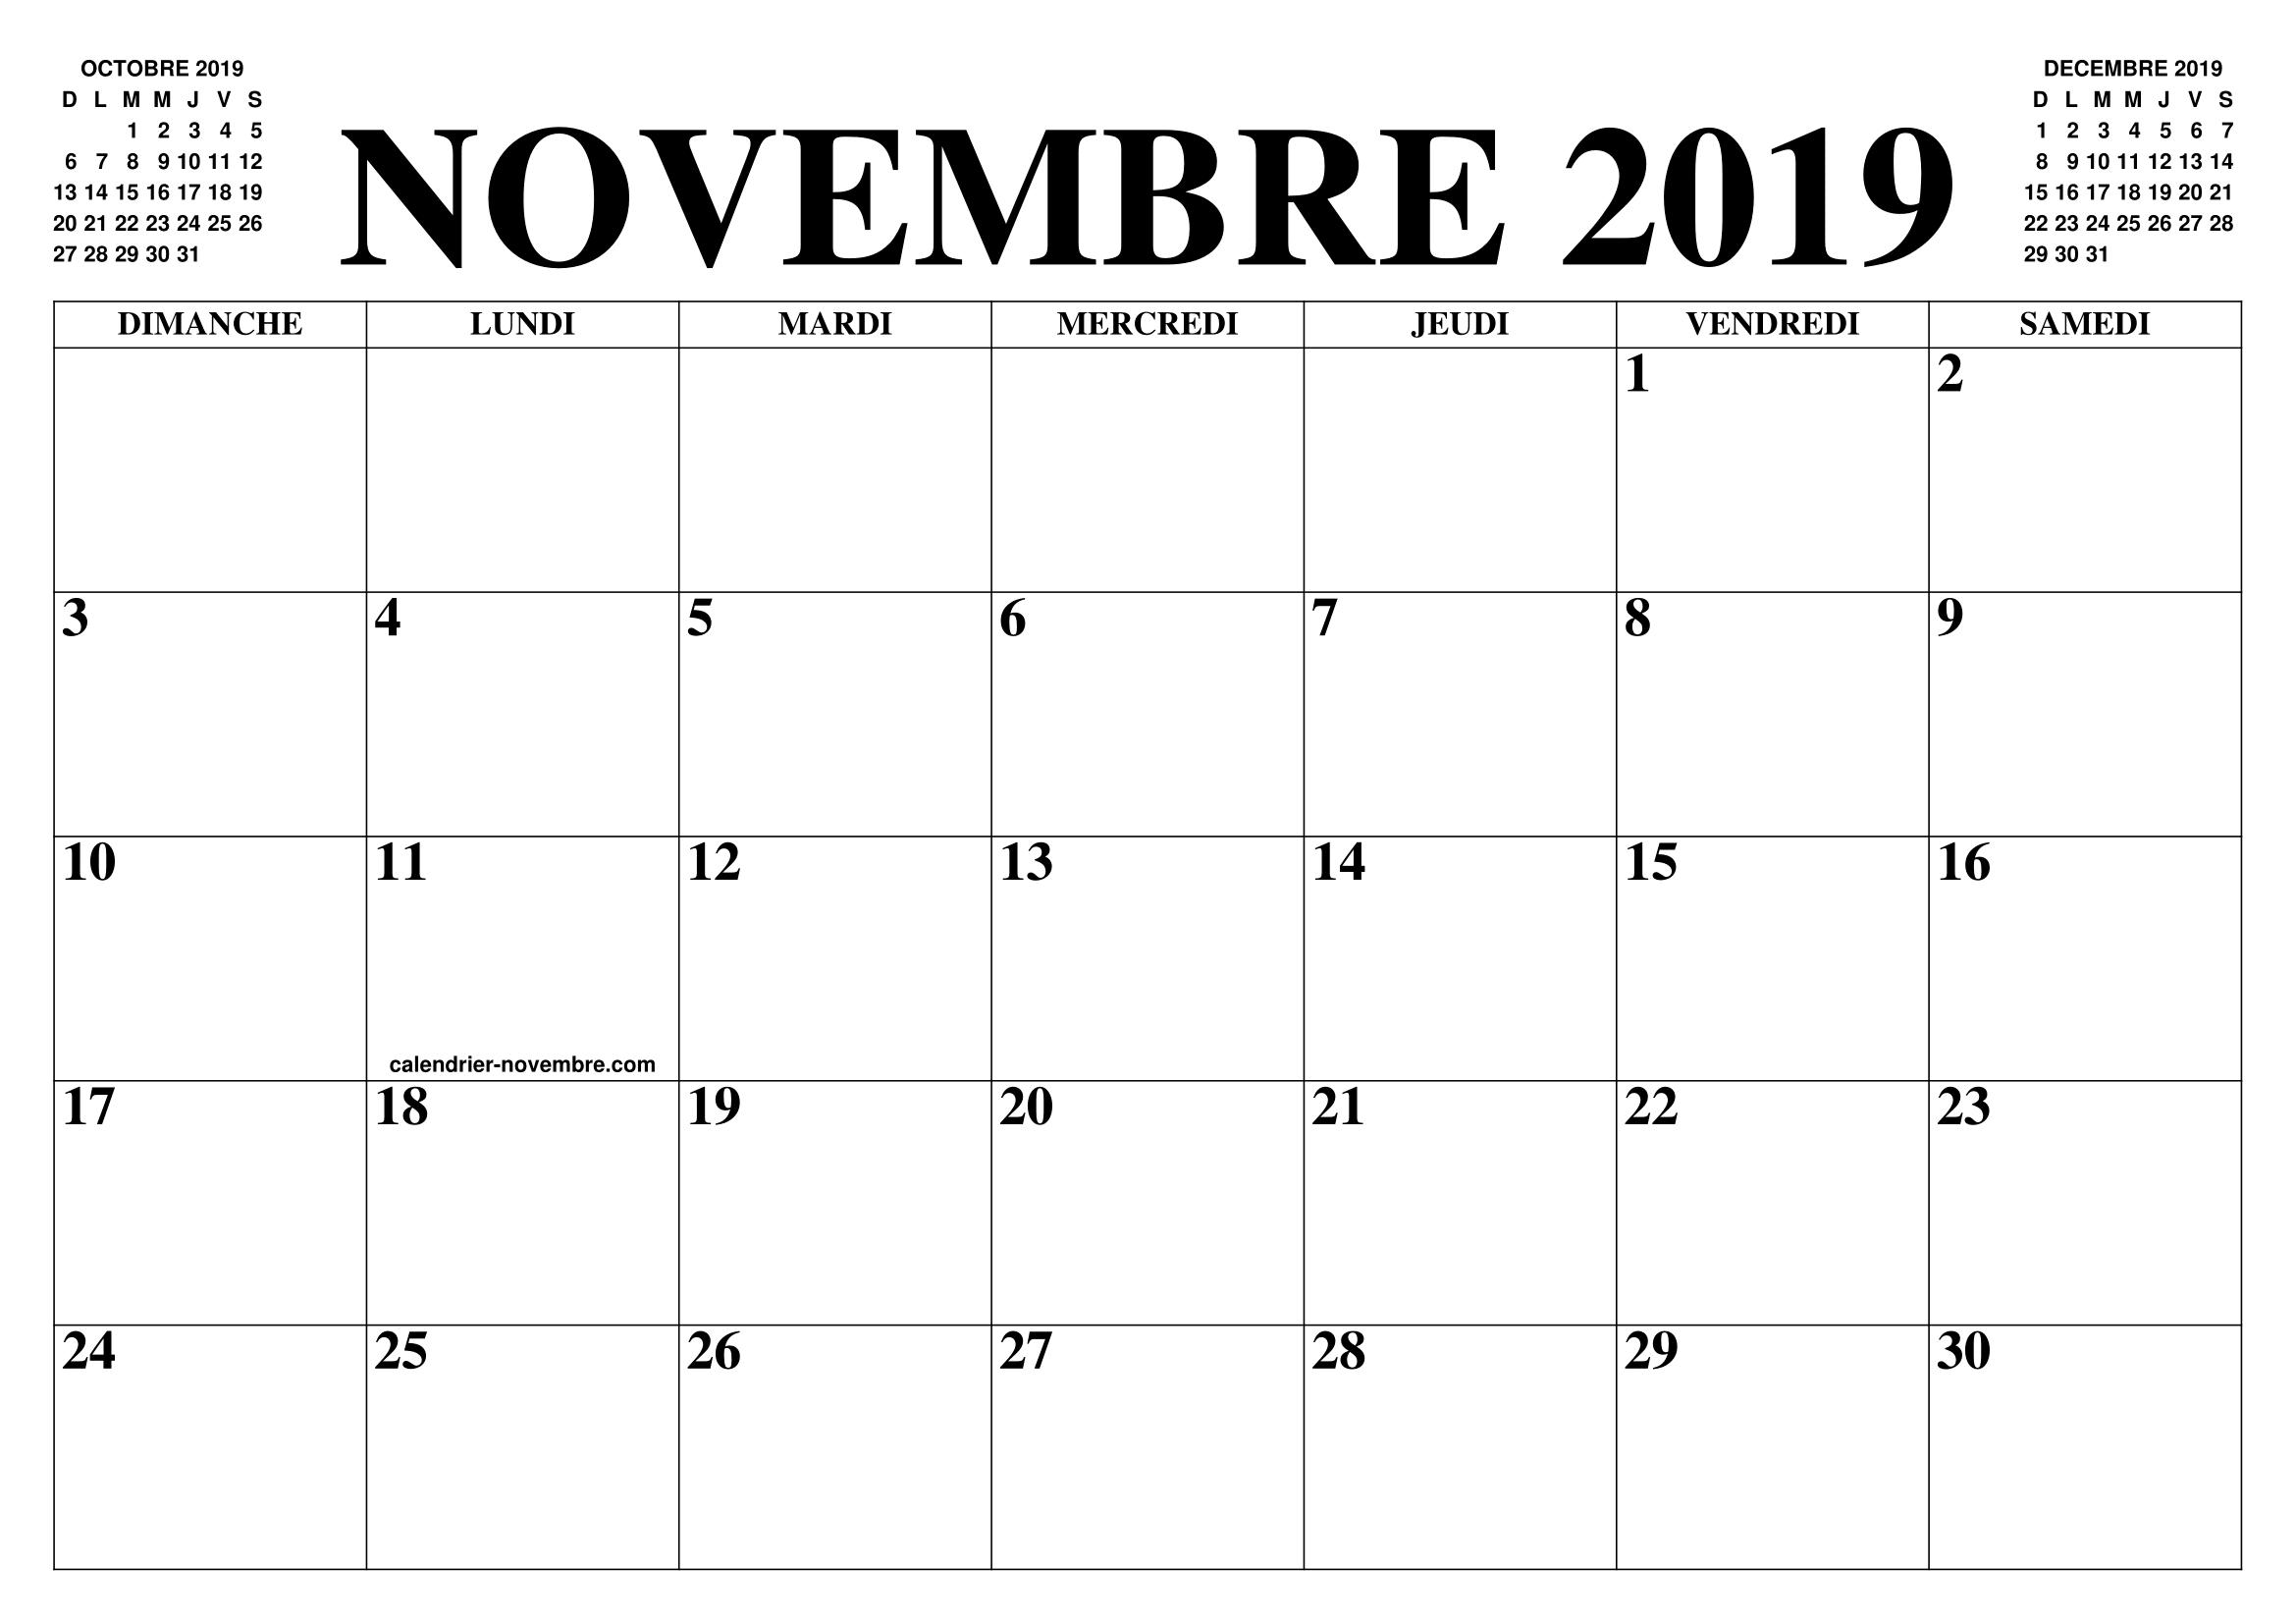 Calendrier A Imprimer Novembre 2019.Calendrier Novembre 2019 2020 Le Calendrier Du Mois De